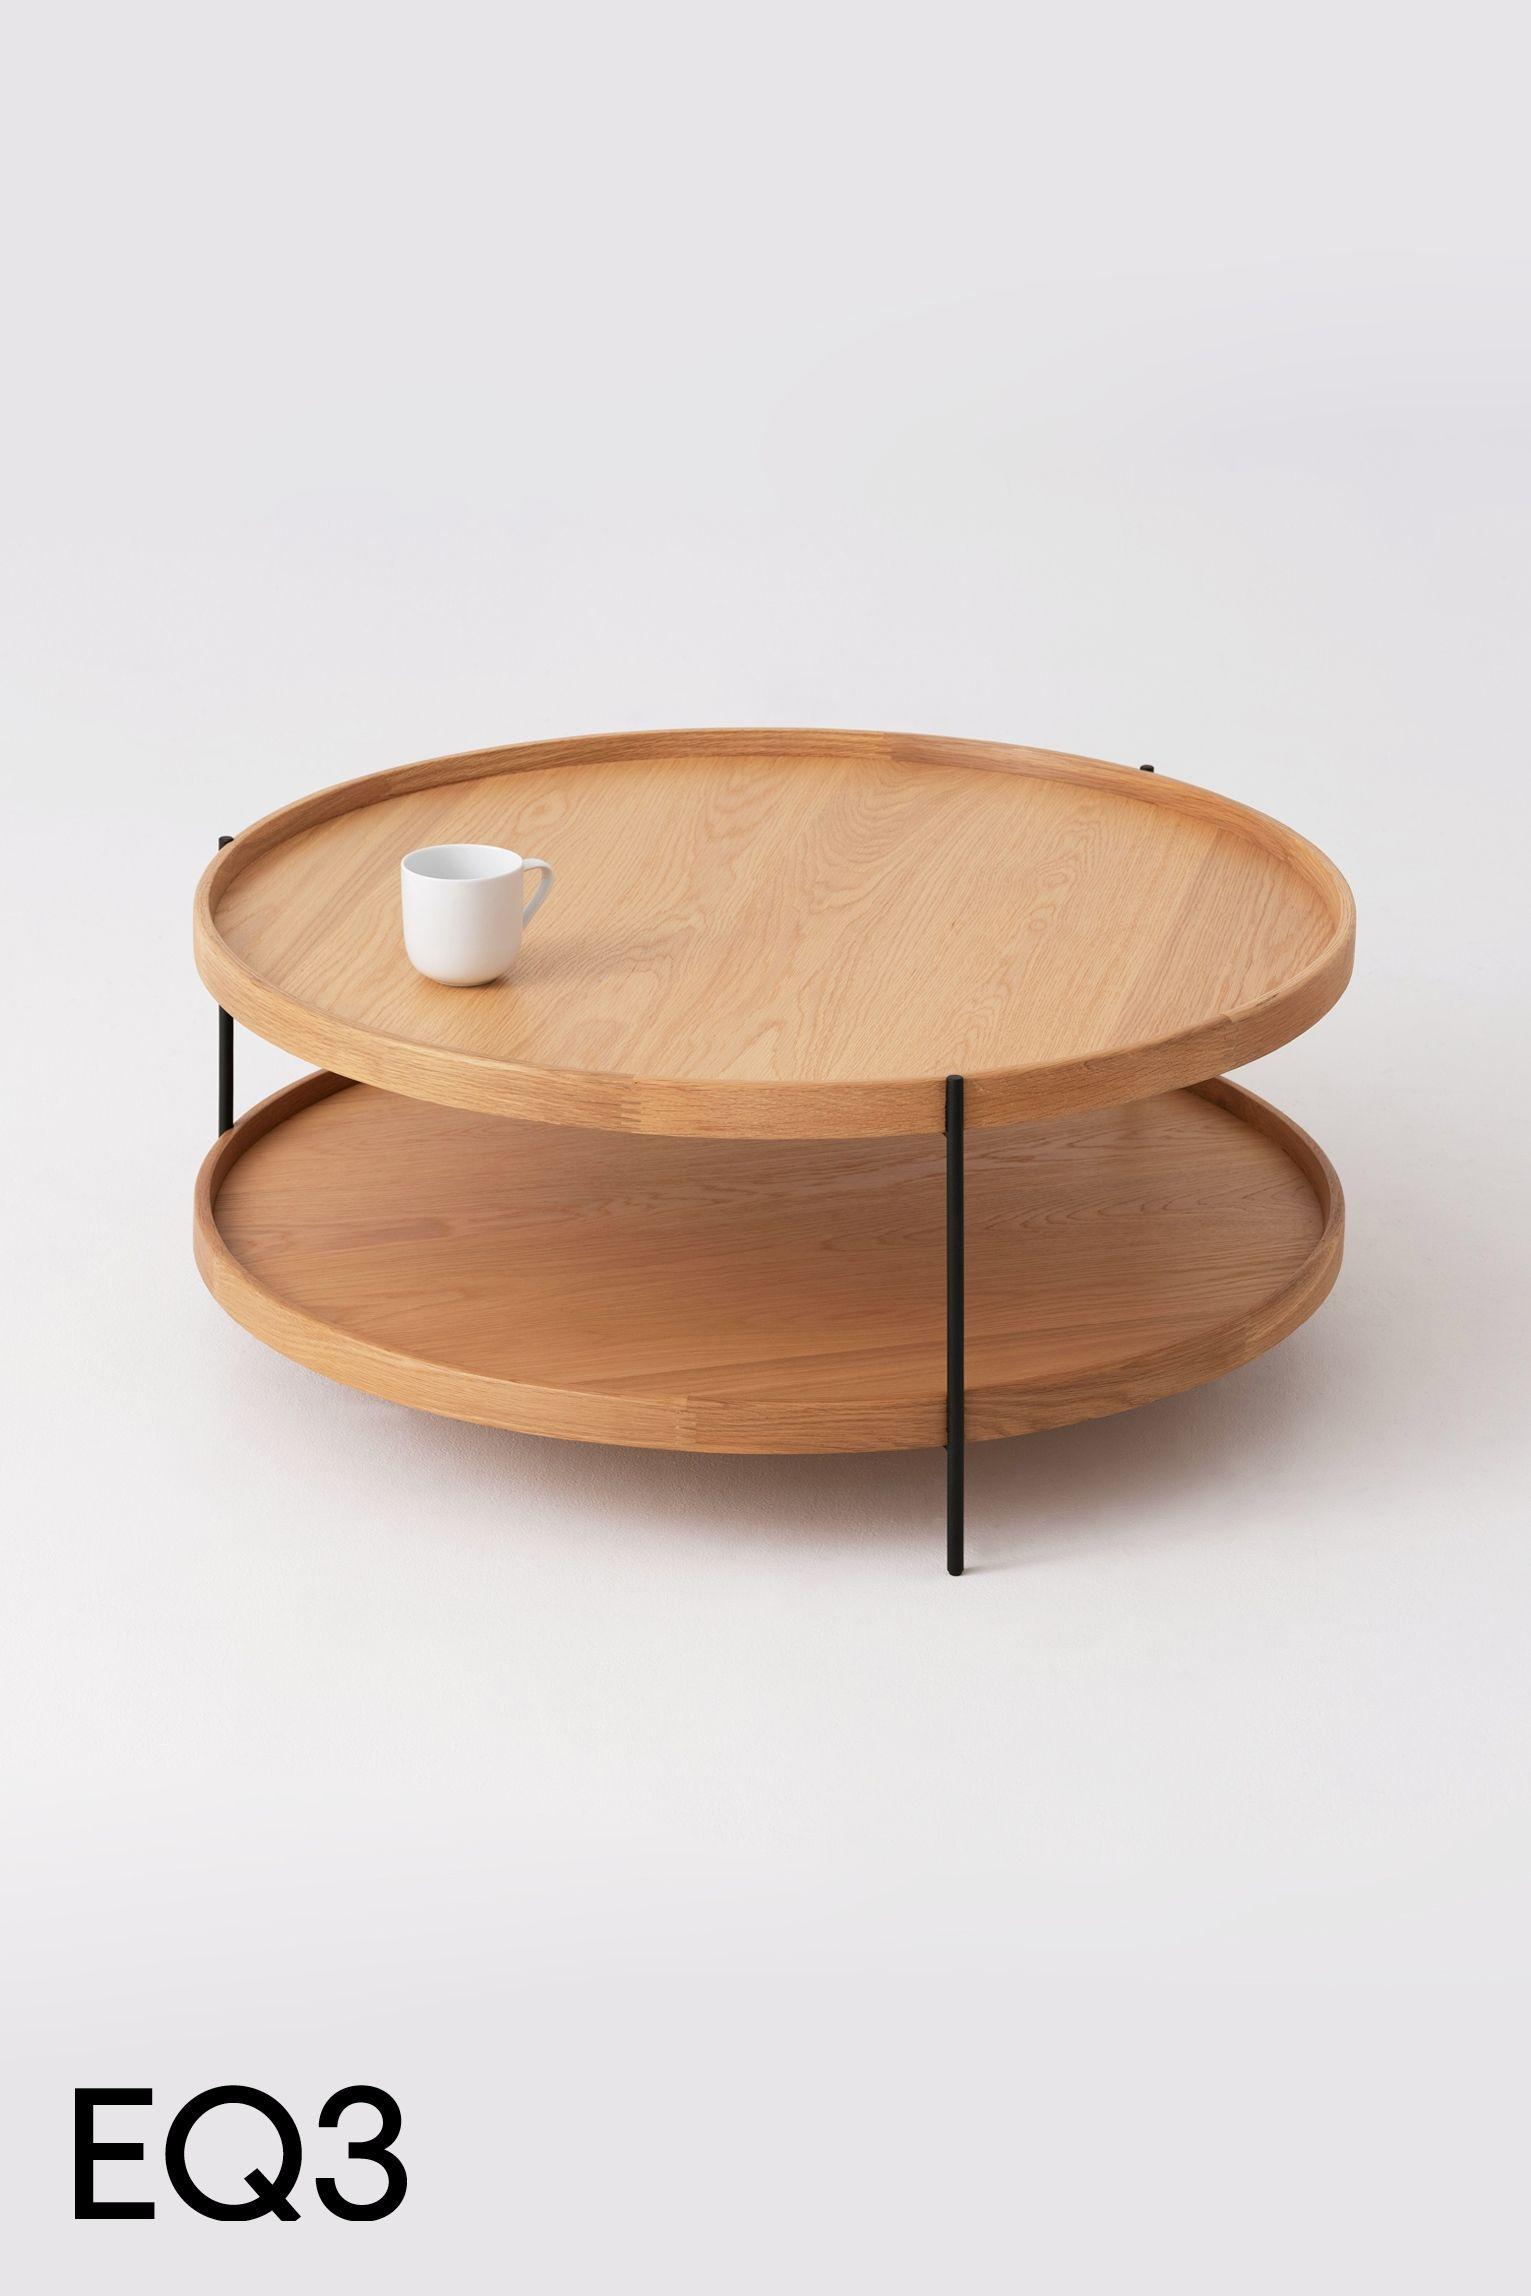 Sage Round Coffee Table Minimalist Coffee Tables In 2021 Minimalist Coffee Table Round Coffee Table Coffee Table [ 2296 x 1531 Pixel ]